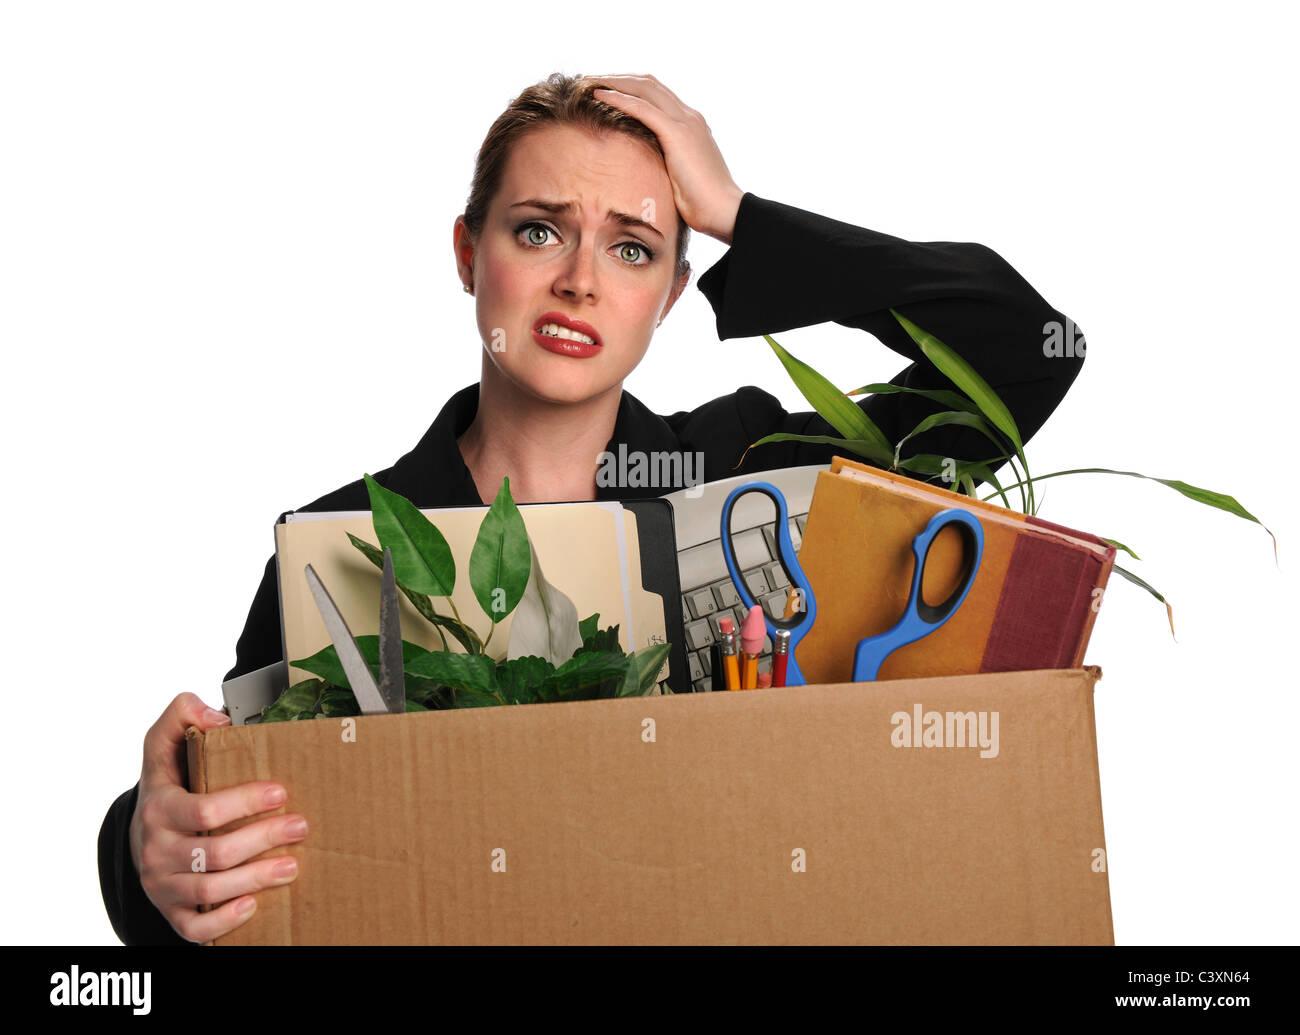 Upset businesswoman carrying office belongings after loosing job - Stock Image